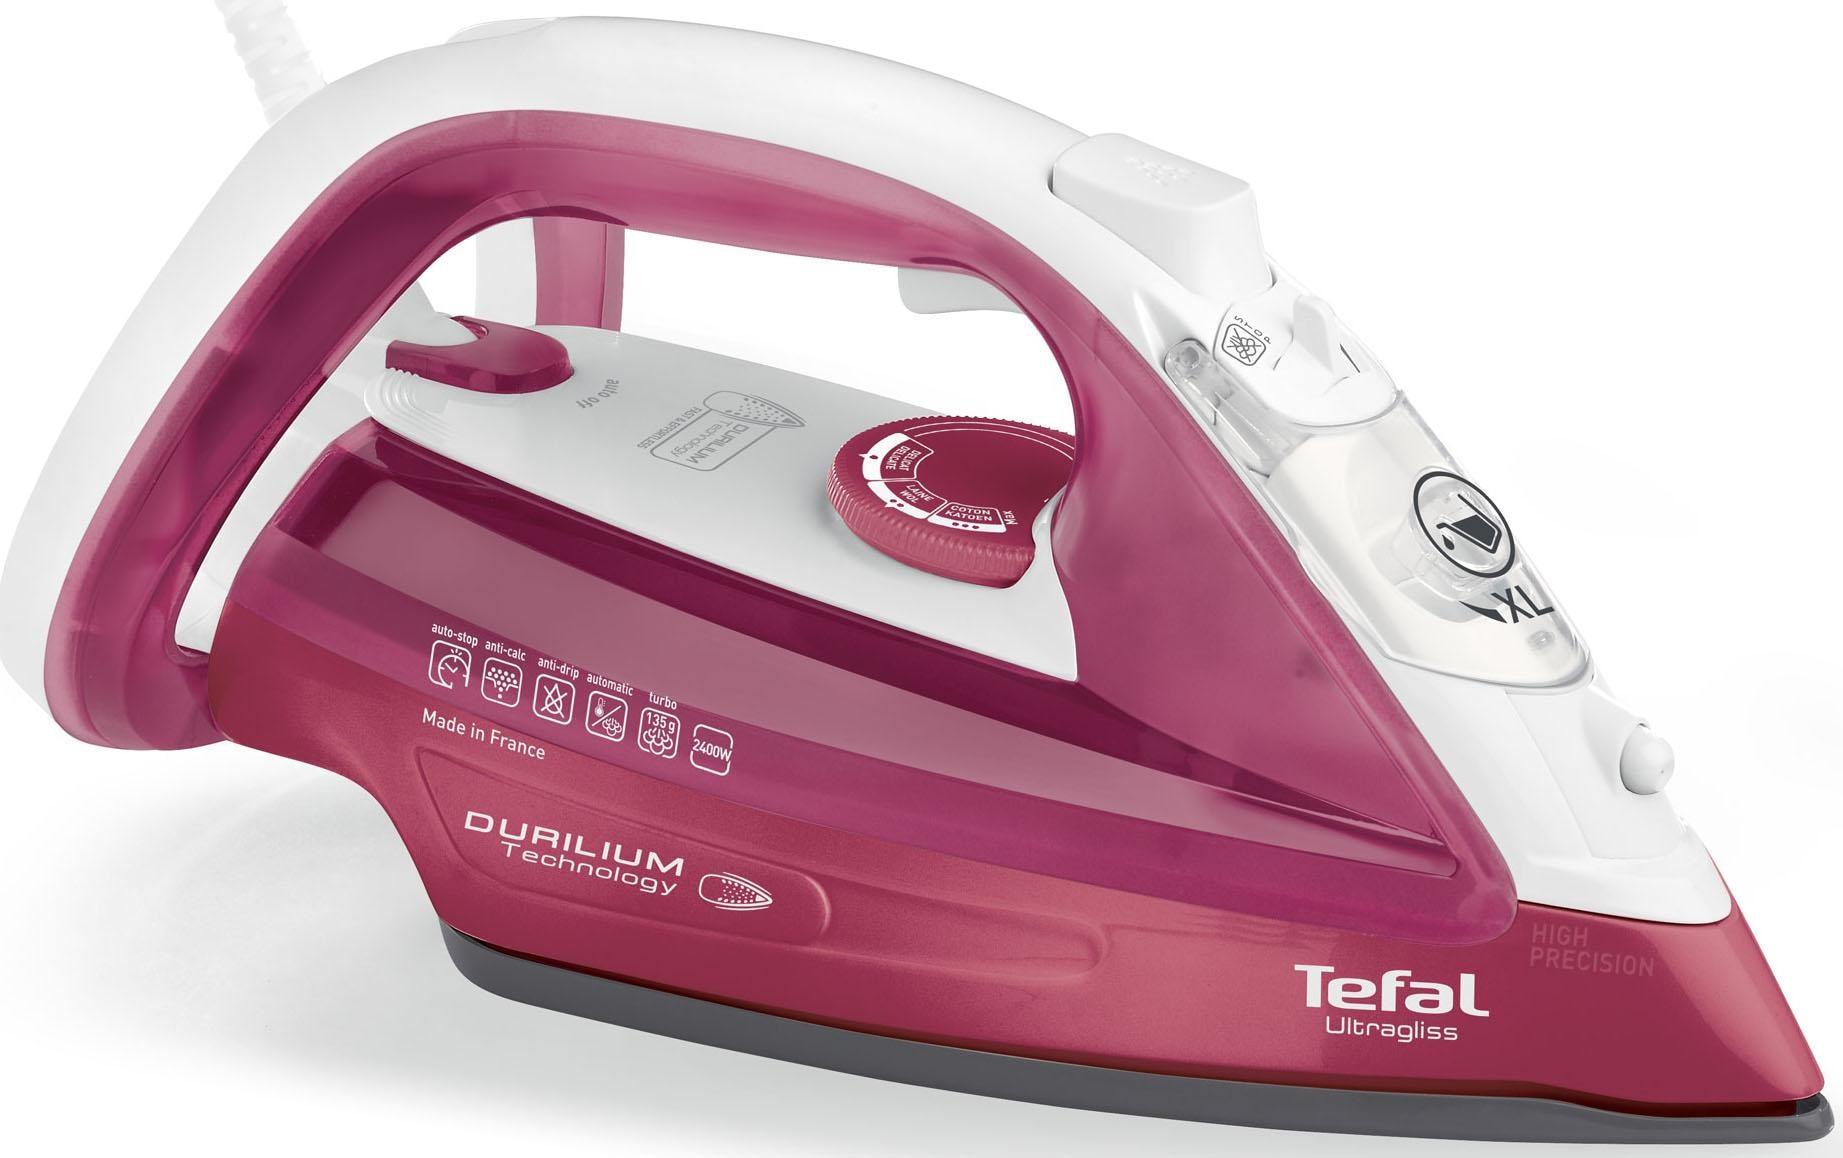 Tefal Dampfbügeleisen FV4920 Ultragliss, 2400 Watt | Flur & Diele > Haushaltsgeräte > Bügeleisen | Rot | Tefal